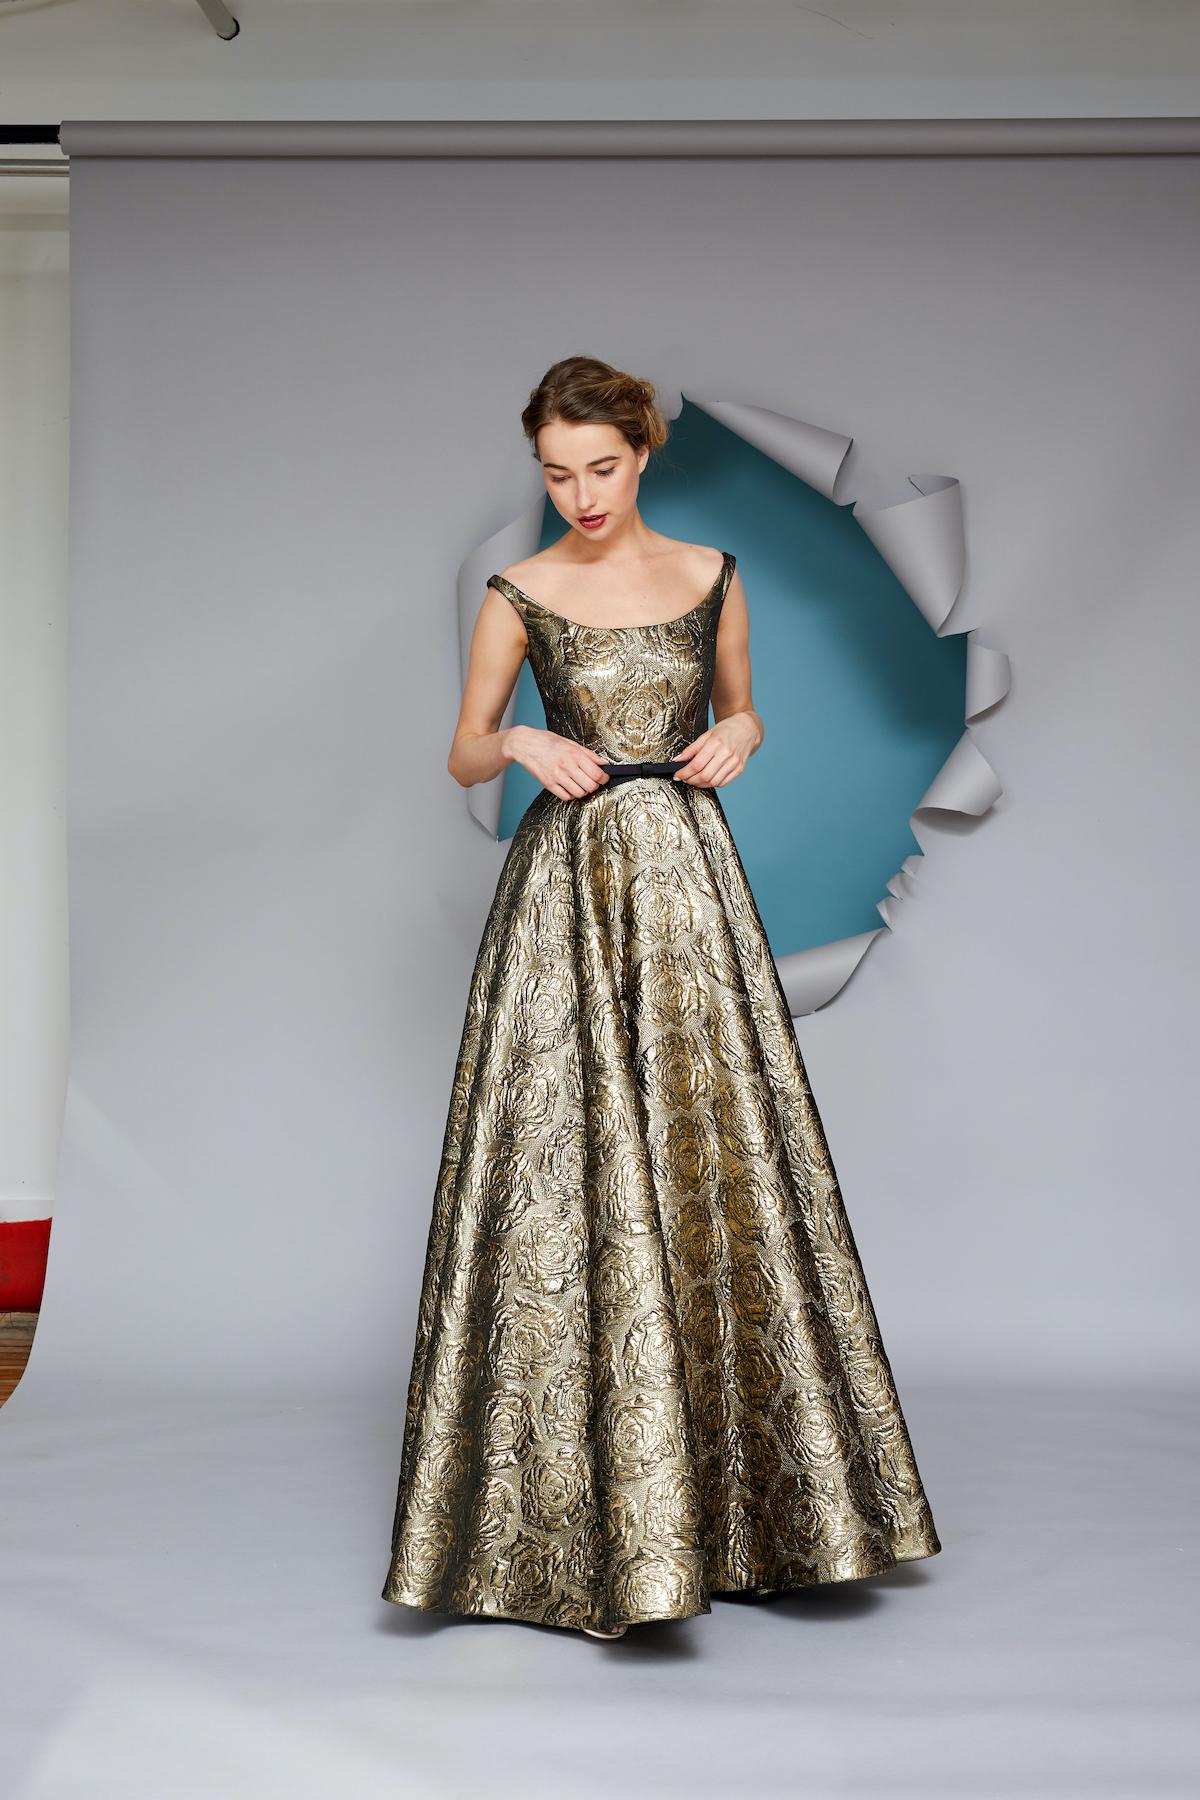 Floor-length off-the-shoulder gold dress for Mother of the Bride